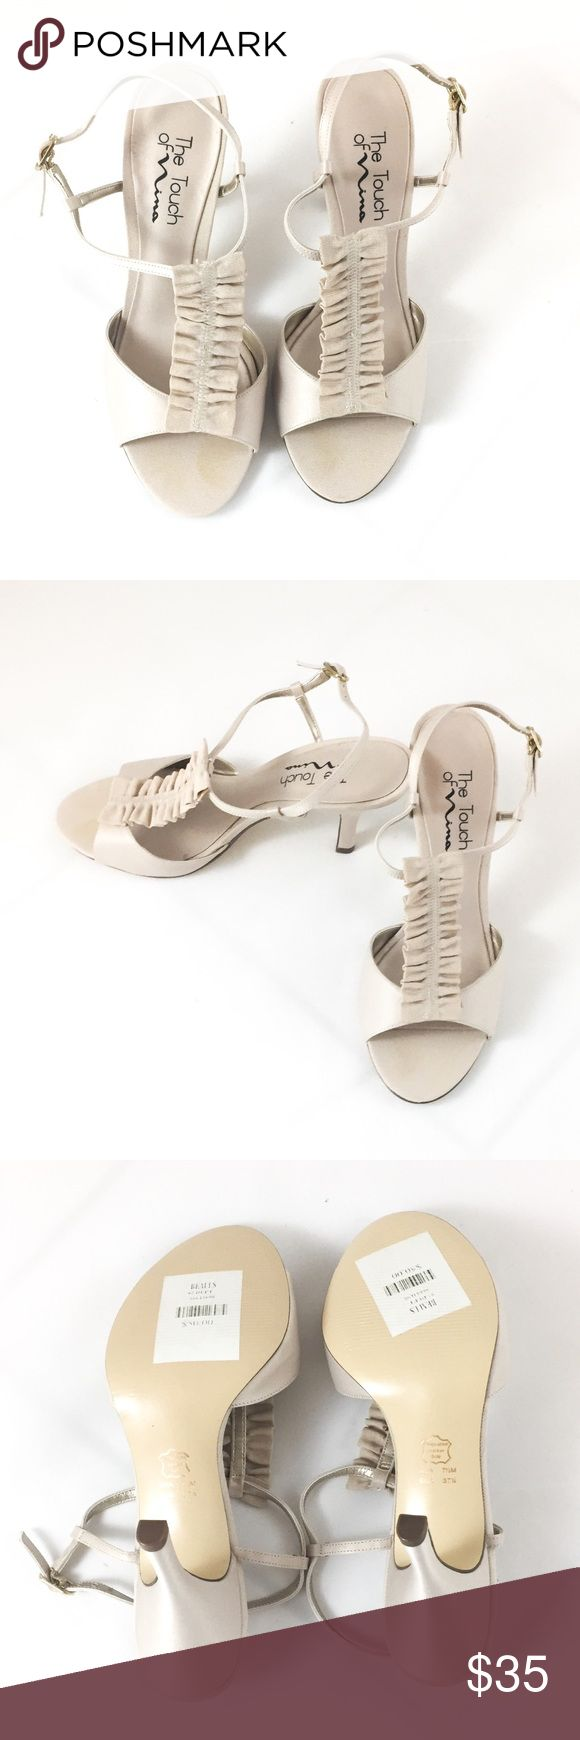 Nina cream strappy heels with ruffle BNWT Touch of Nina cream strappy sandal heels with ruffle. Brand New With Tags. Size 7.5. Nina Shoes Heels